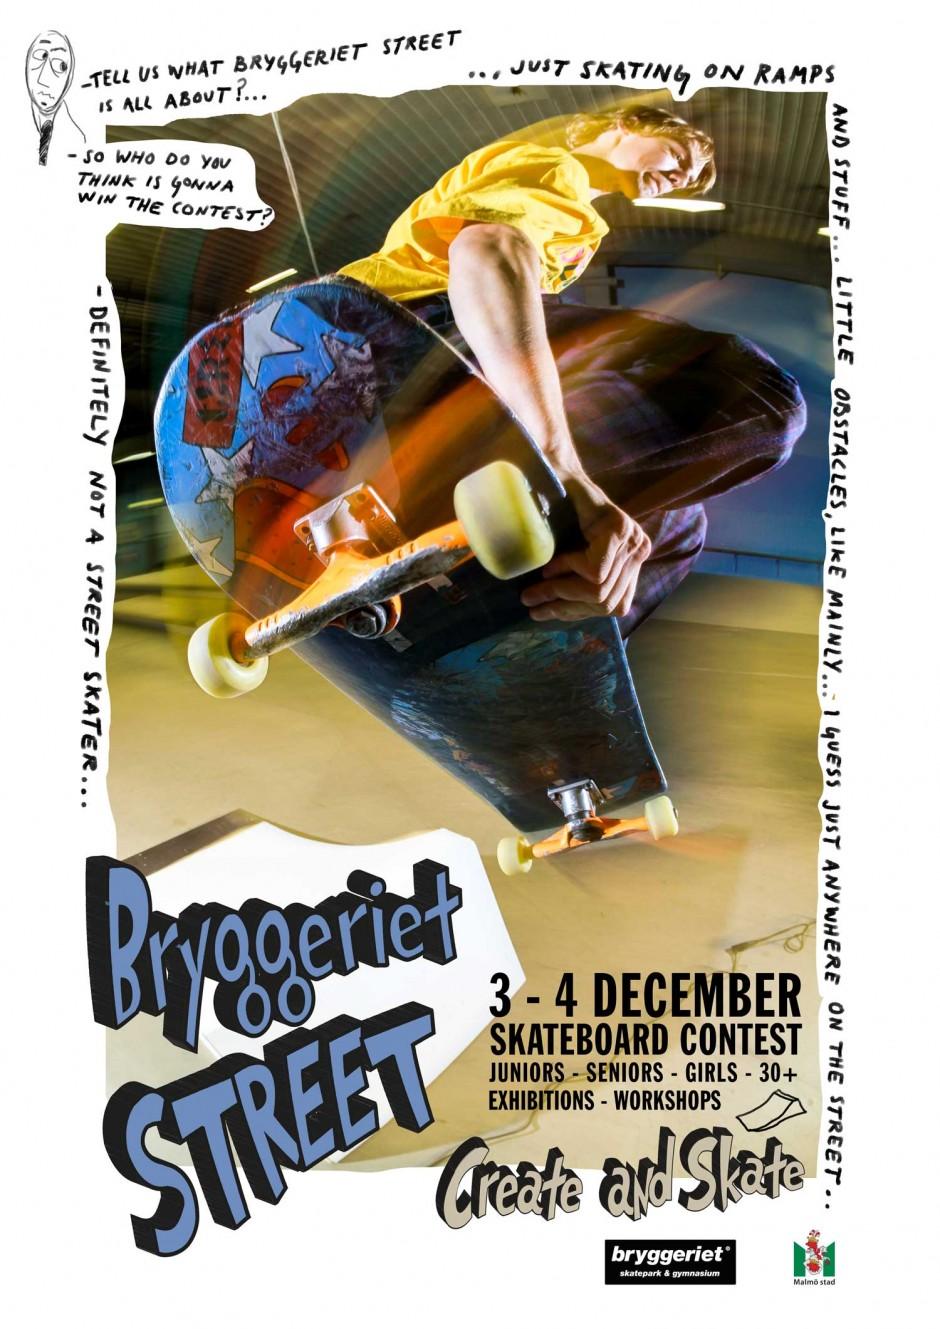 Bryggeriet-Street-2016-poster_web1500